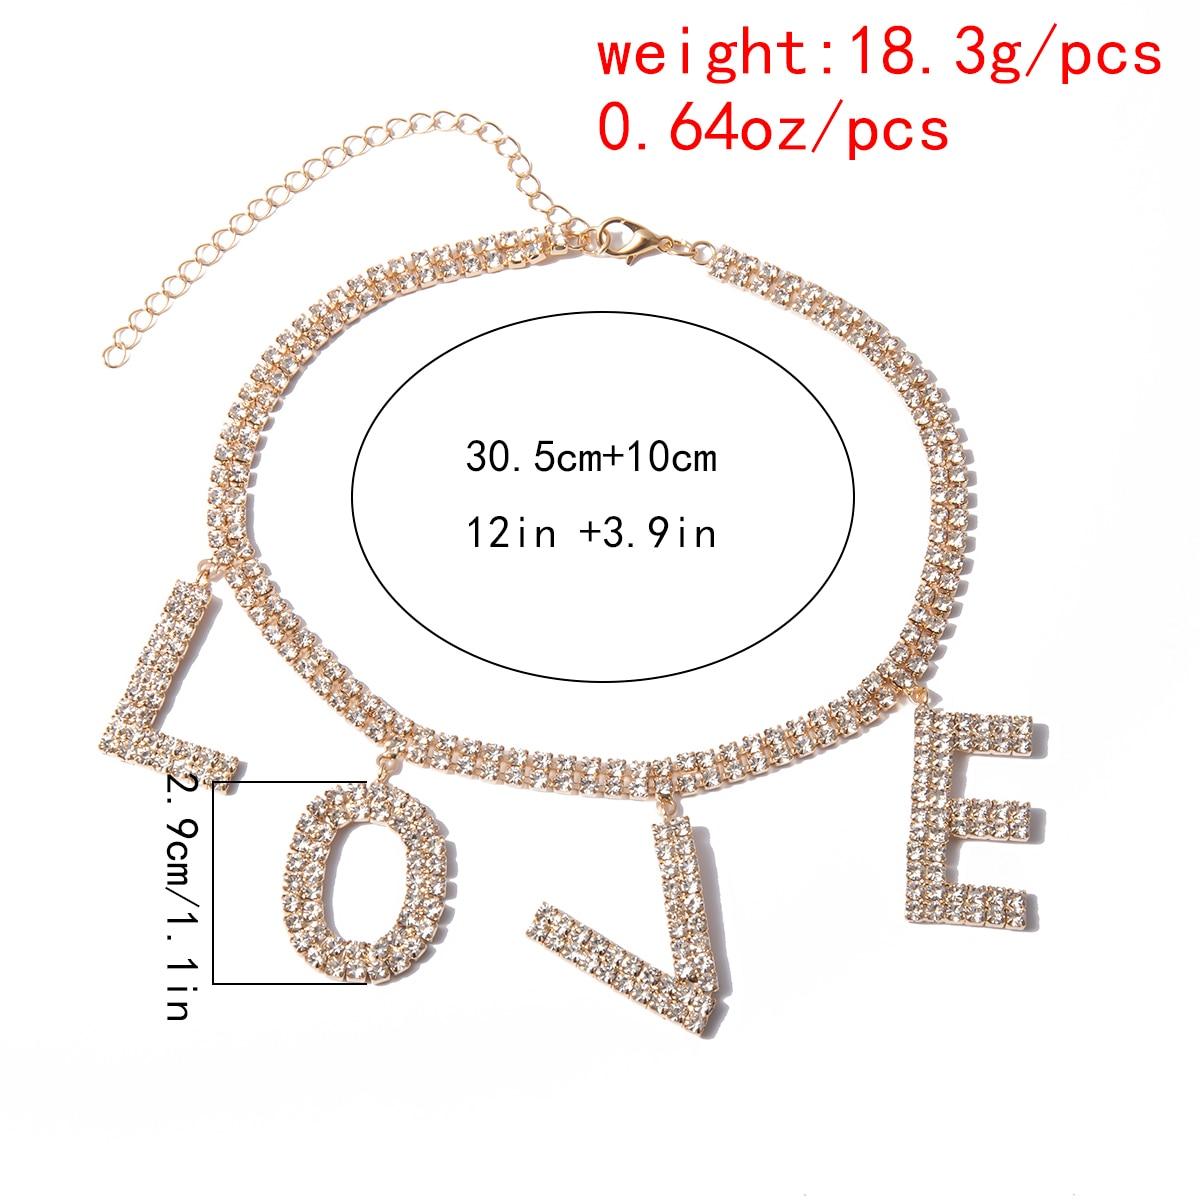 Купить с кэшбэком Luxury Crystal Love Letter Choker Necklace for Women Collar Femme Statement Punk Rhinestone Chain Necklace Couple Gothic Jewelry